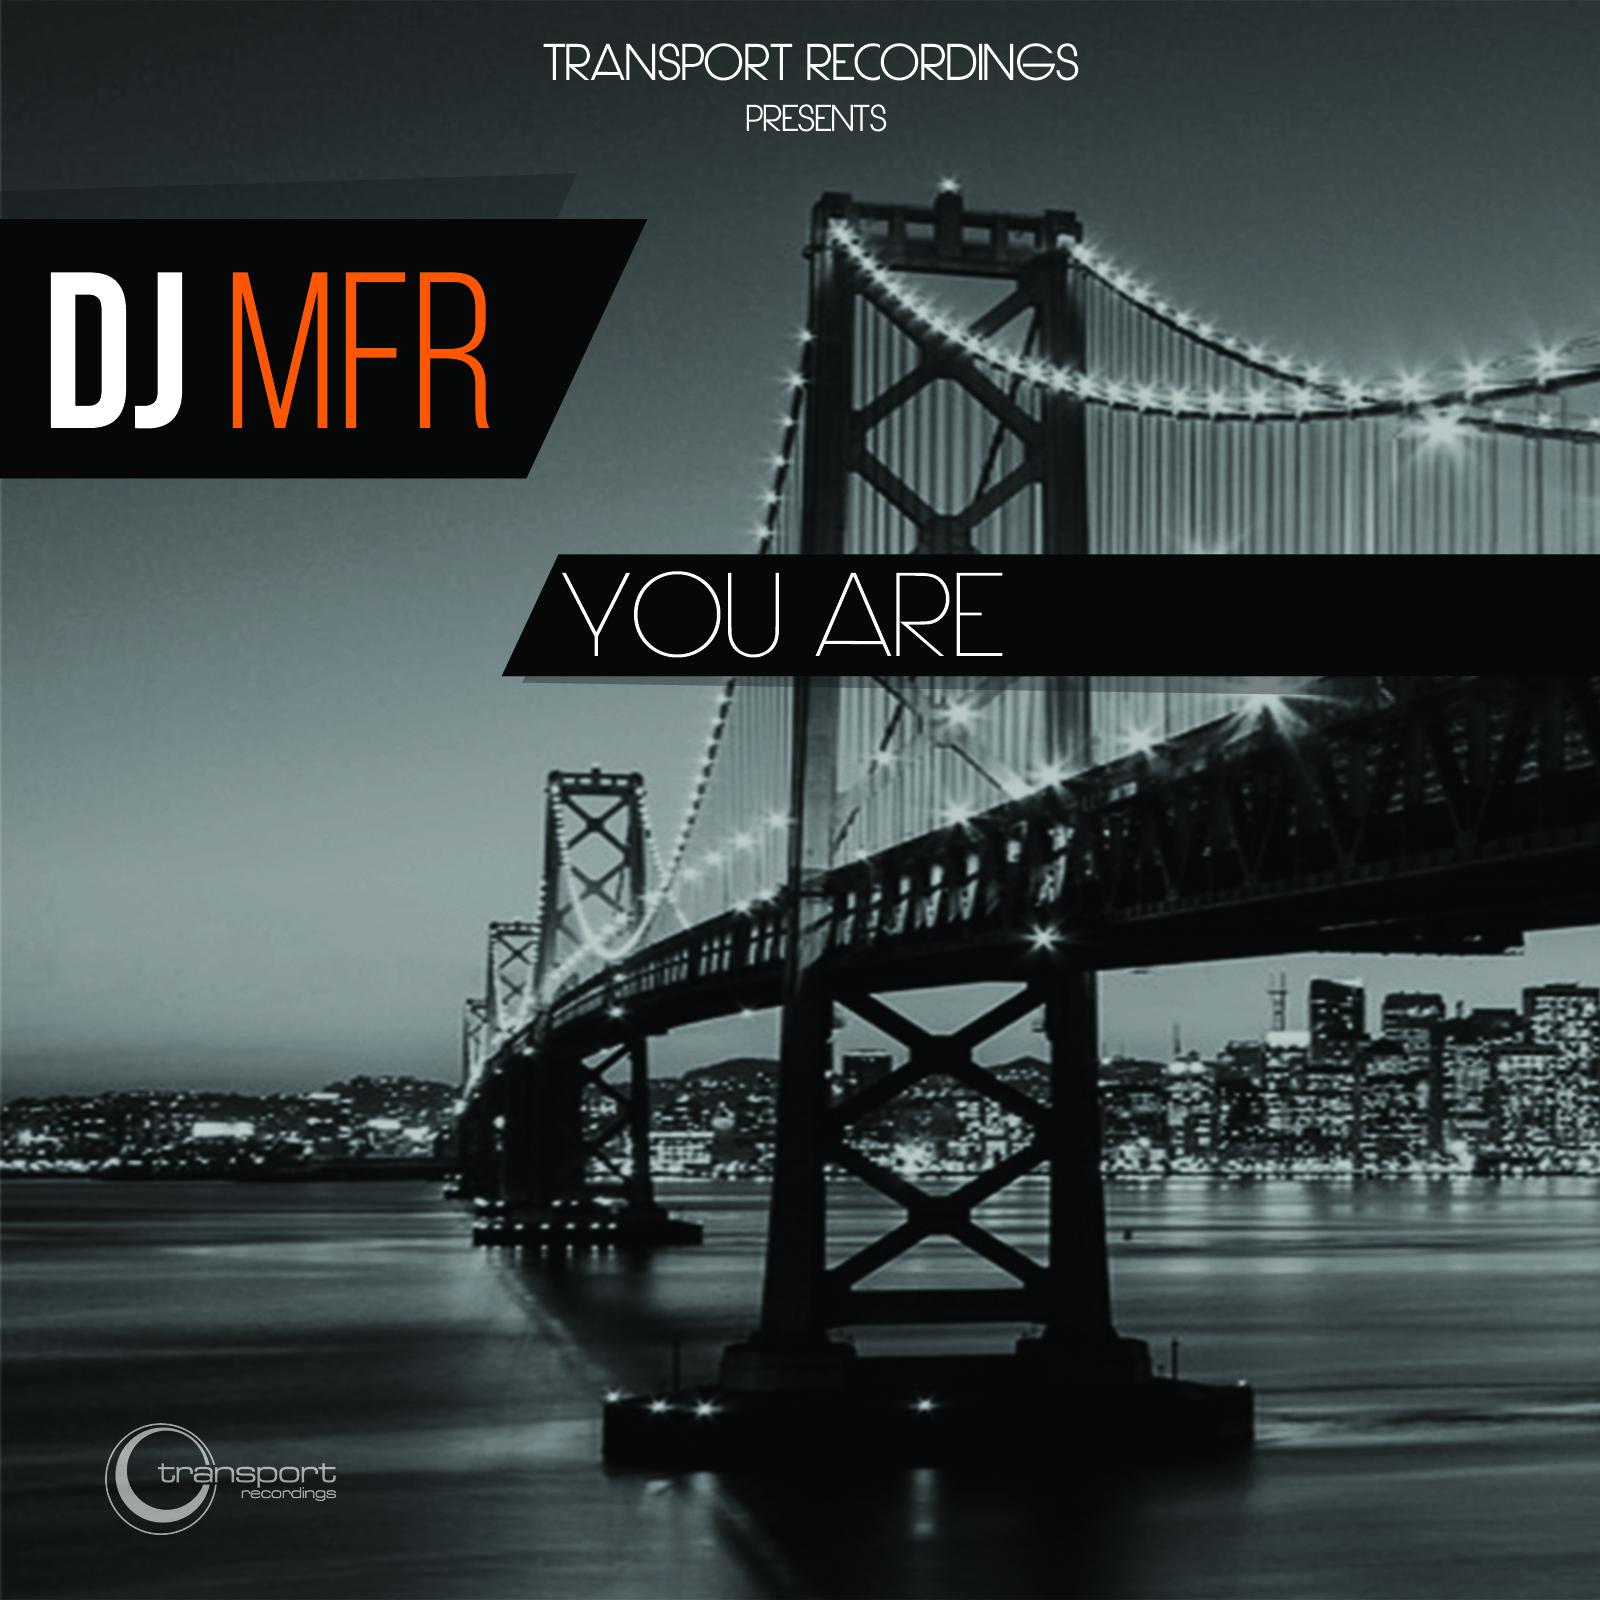 DJ MFR, D'Layana, Hideo Kobayashi - You Are